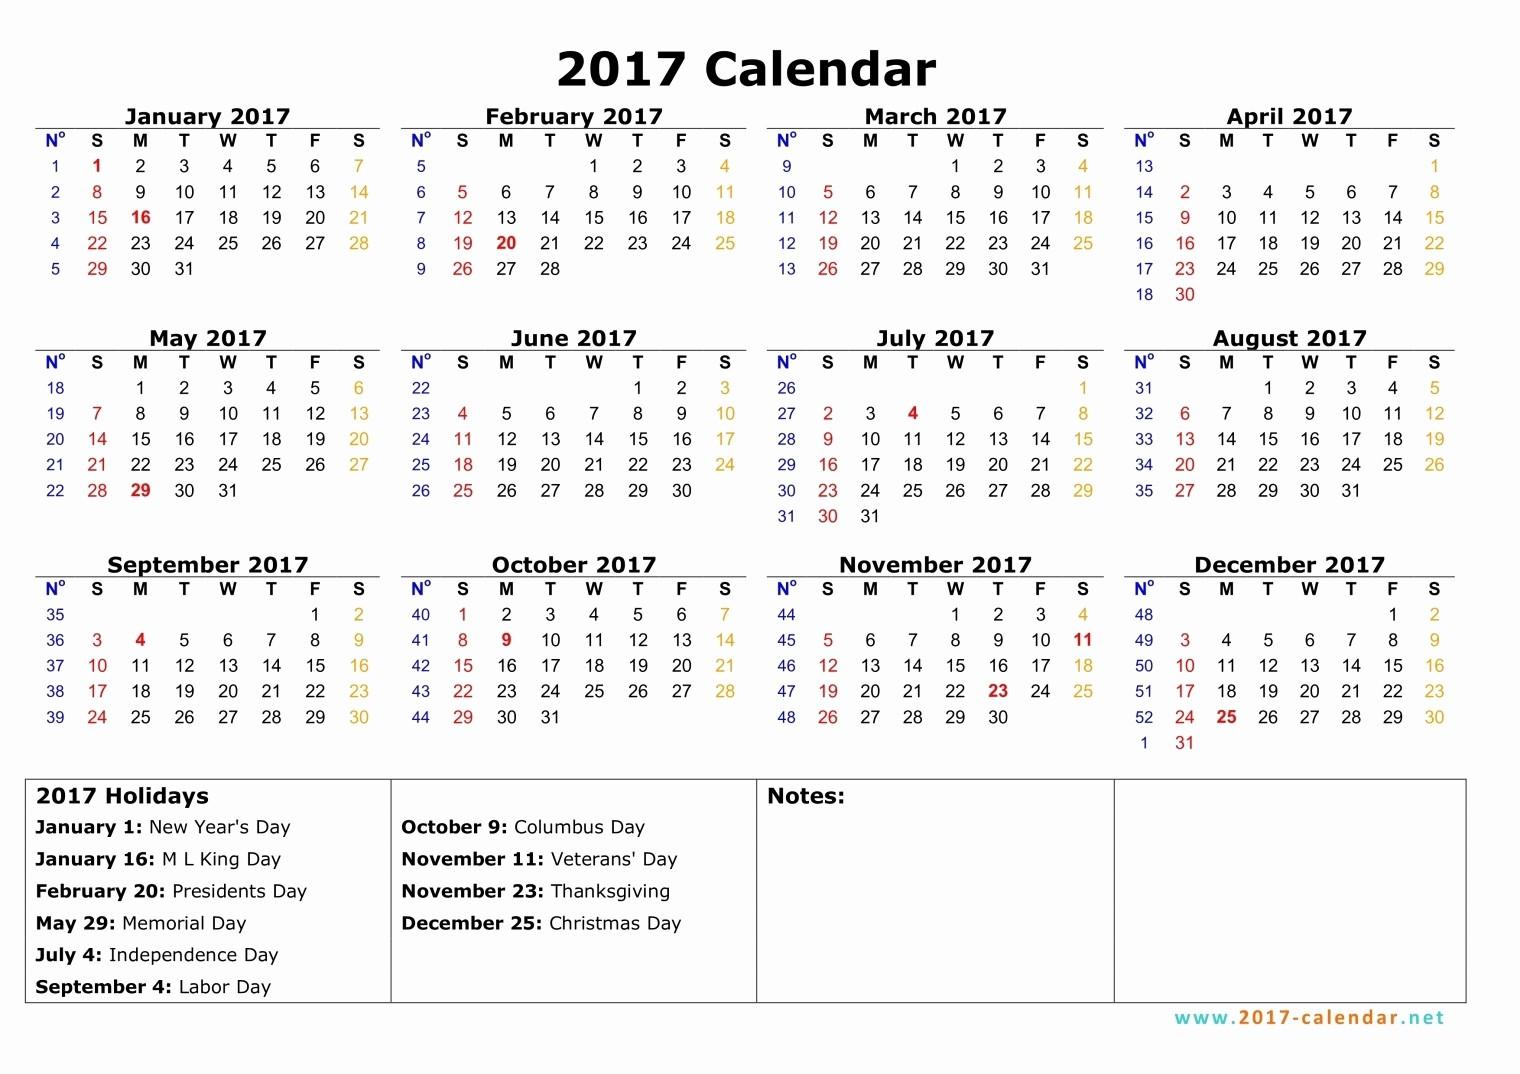 Calendar 2017 Monday to Sunday New Monday to Sunday Monthly Calendar 2017